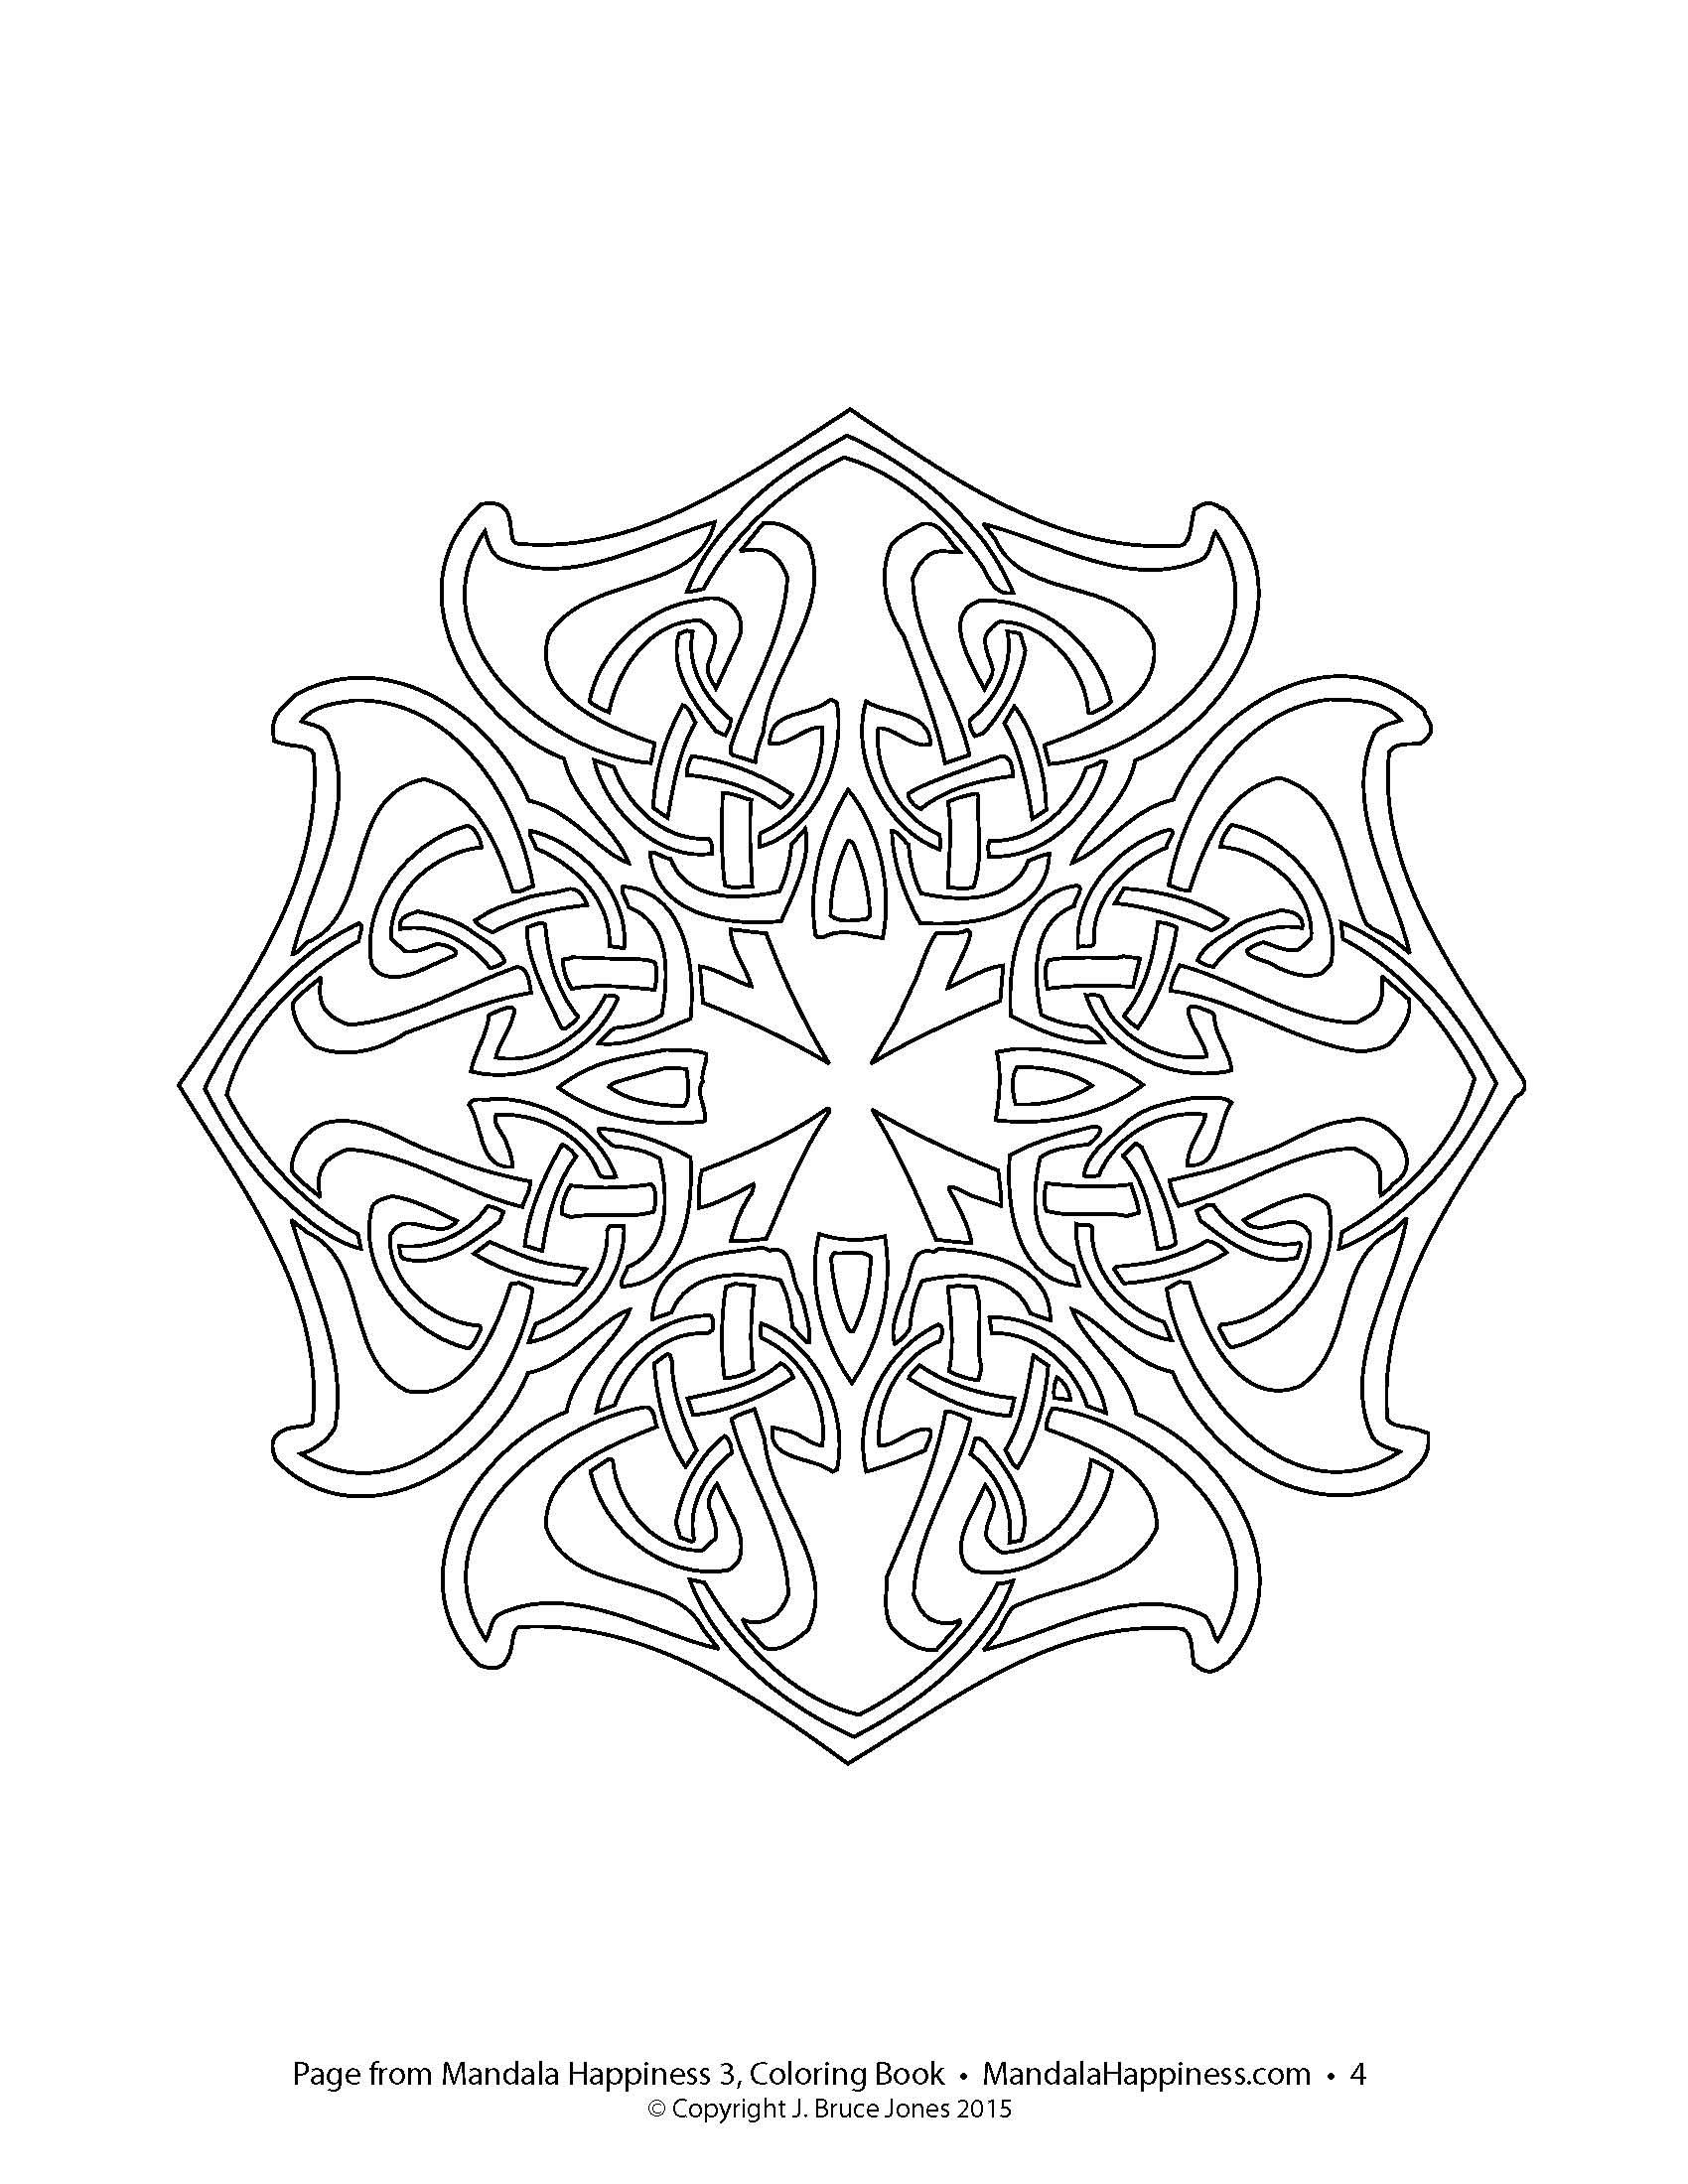 Amazon Mandala Happiness 3 Celtic Designs Coloring Book Volume 9781514180204 J Bruce Jones Books